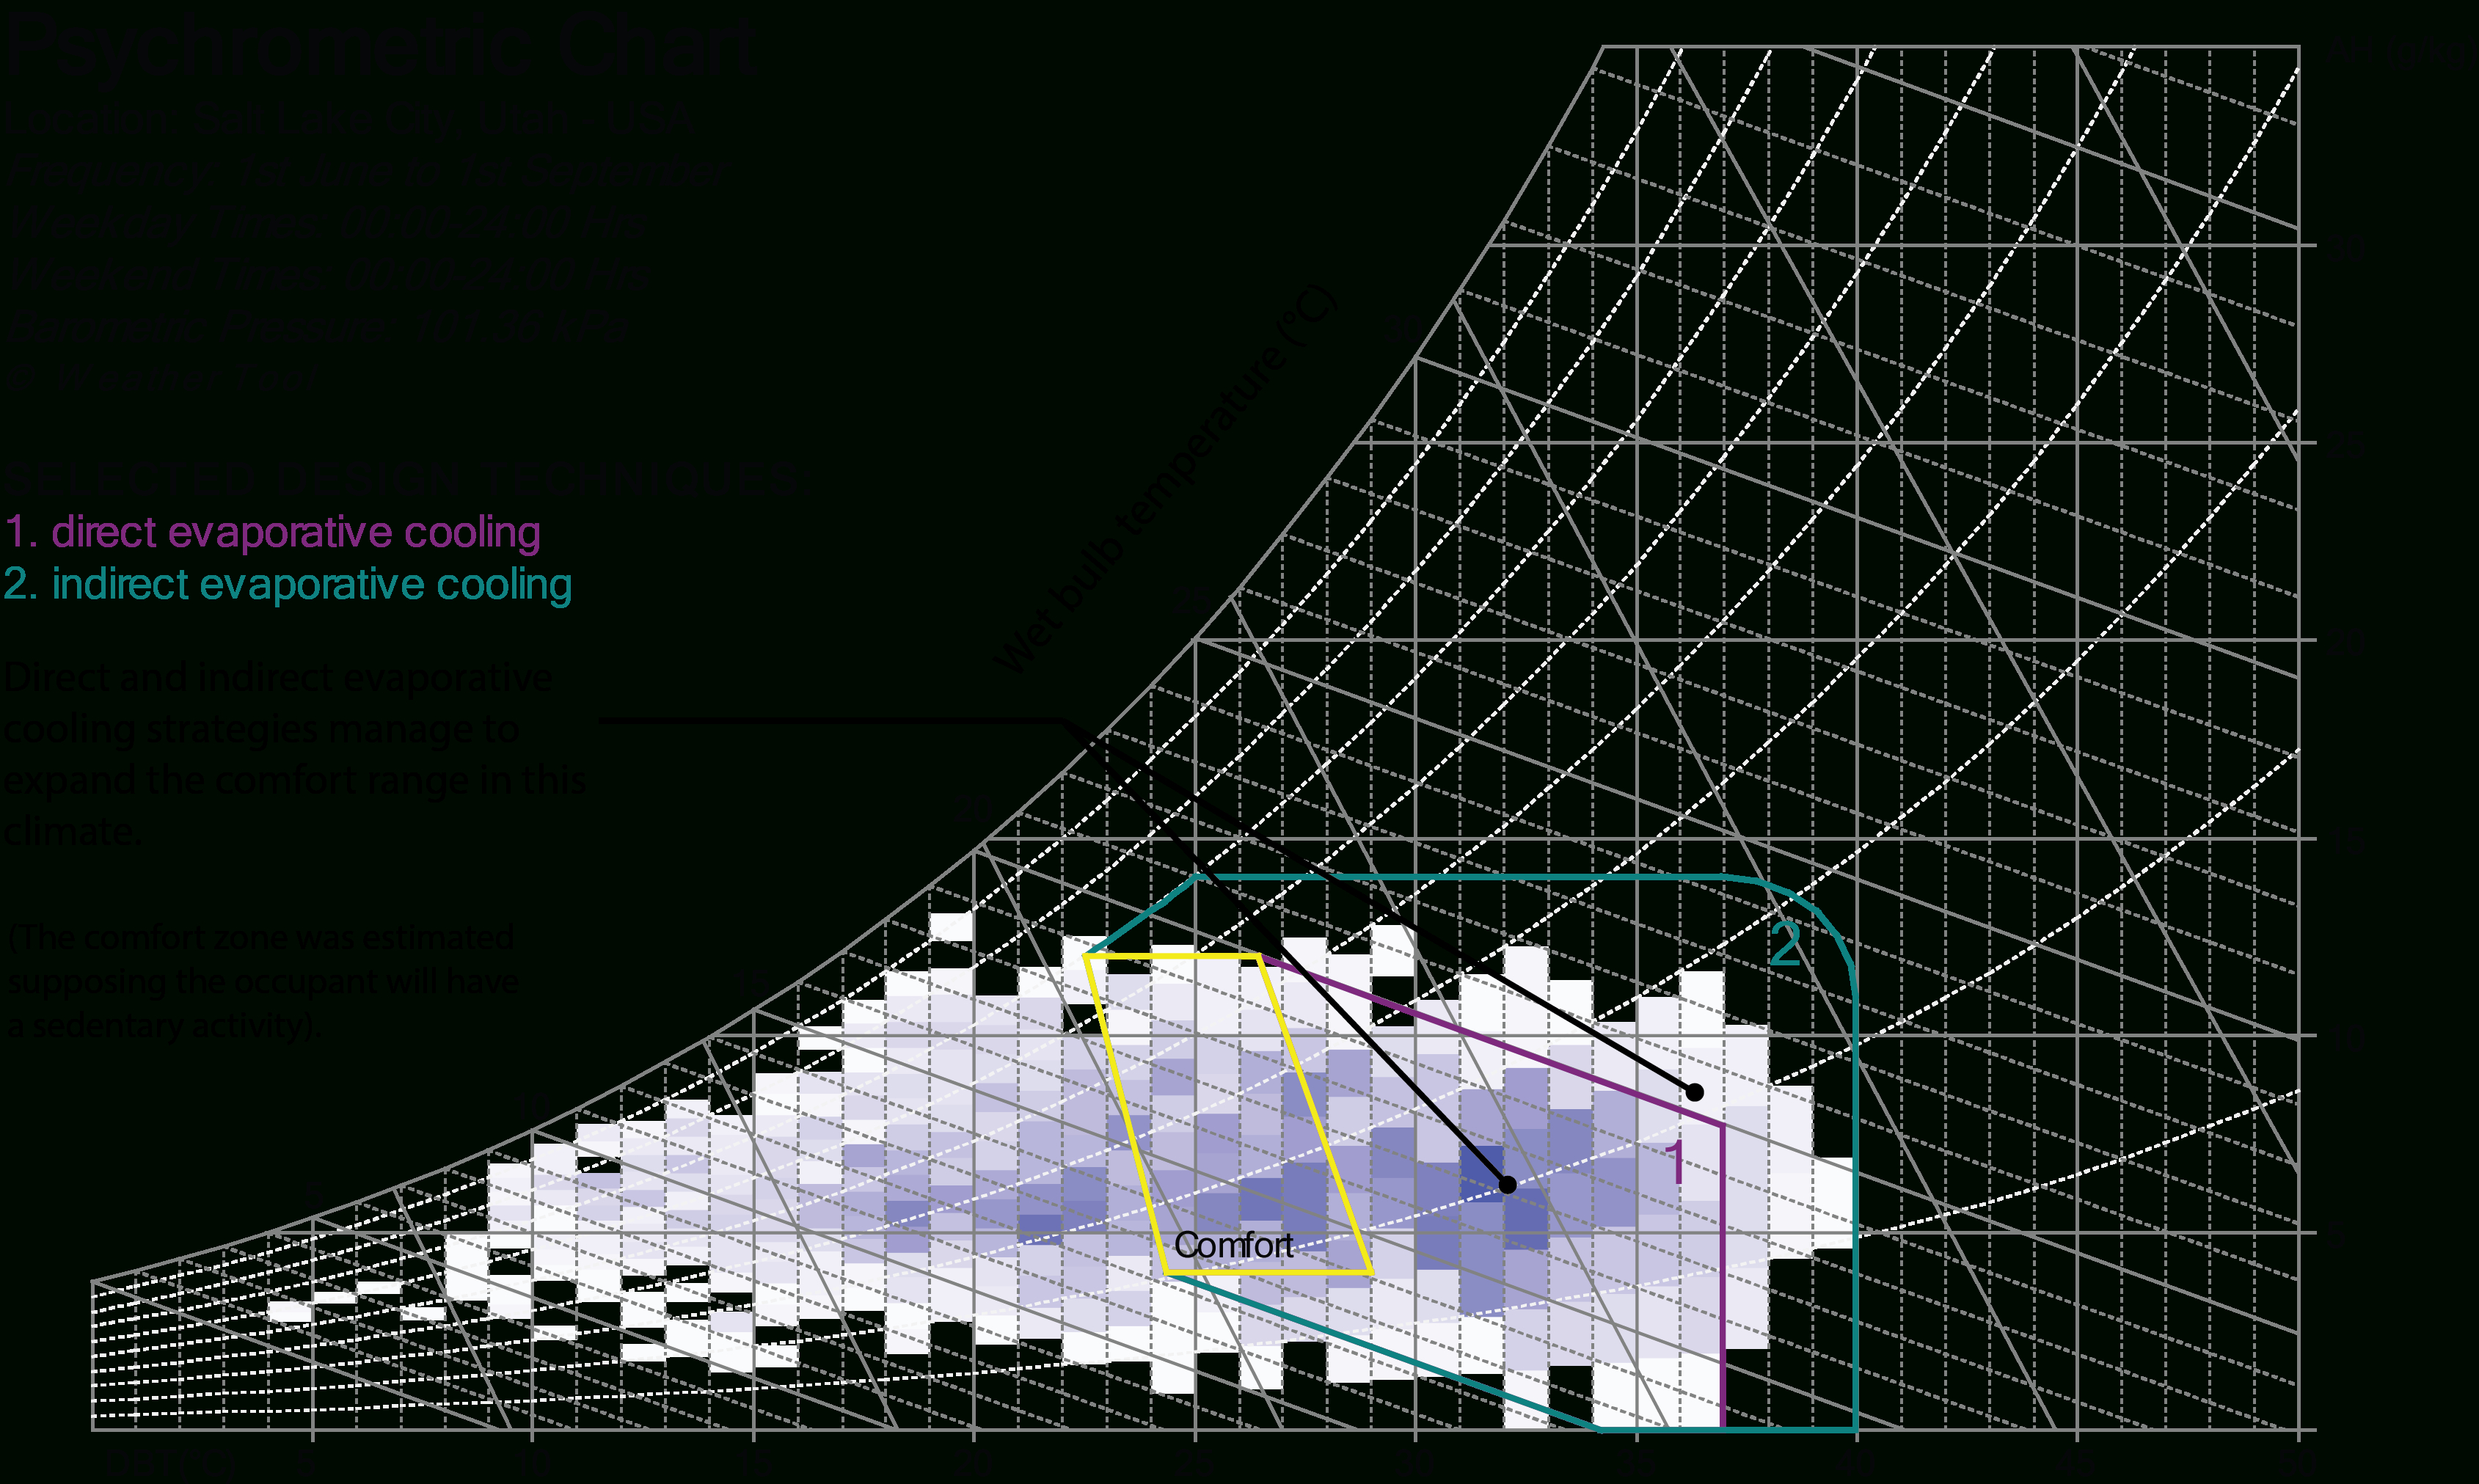 Hd Wallpapers Psychrometric Chart Givoni Dwallandroidawall.ml - Printable Psychrometric Chart Free